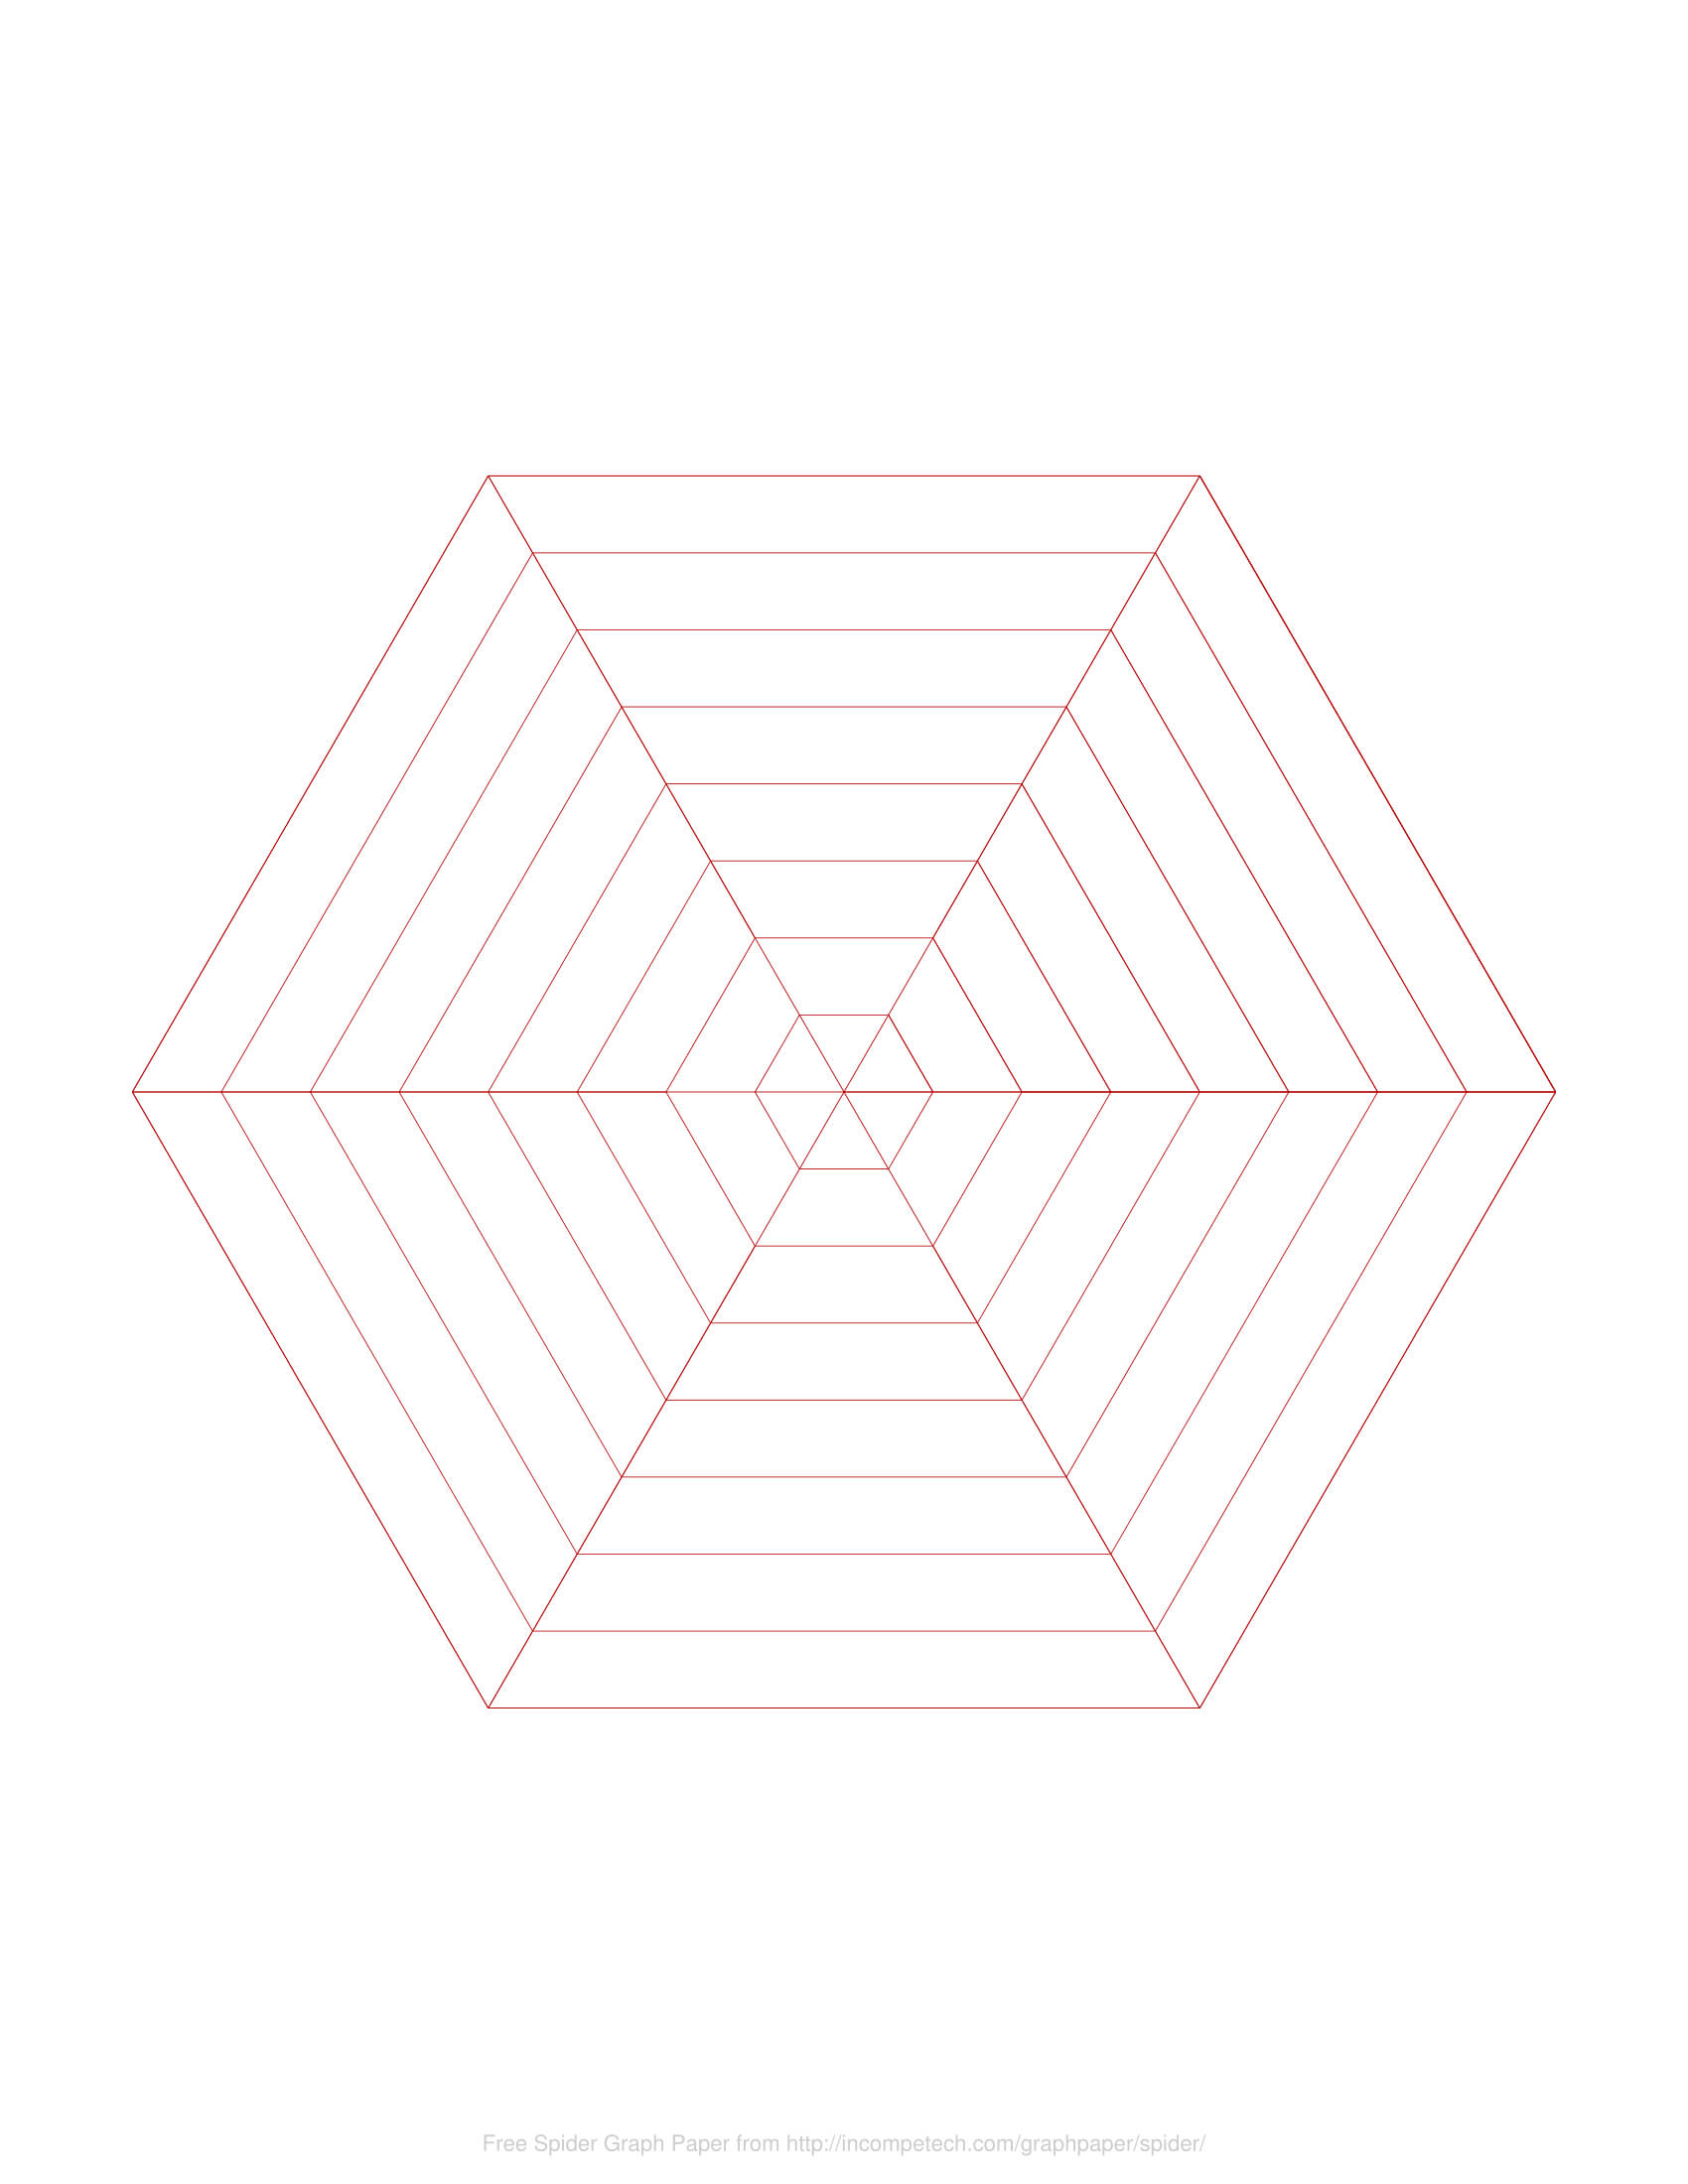 Free Online Graph Paper / Spider Throughout Blank Radar Chart Template